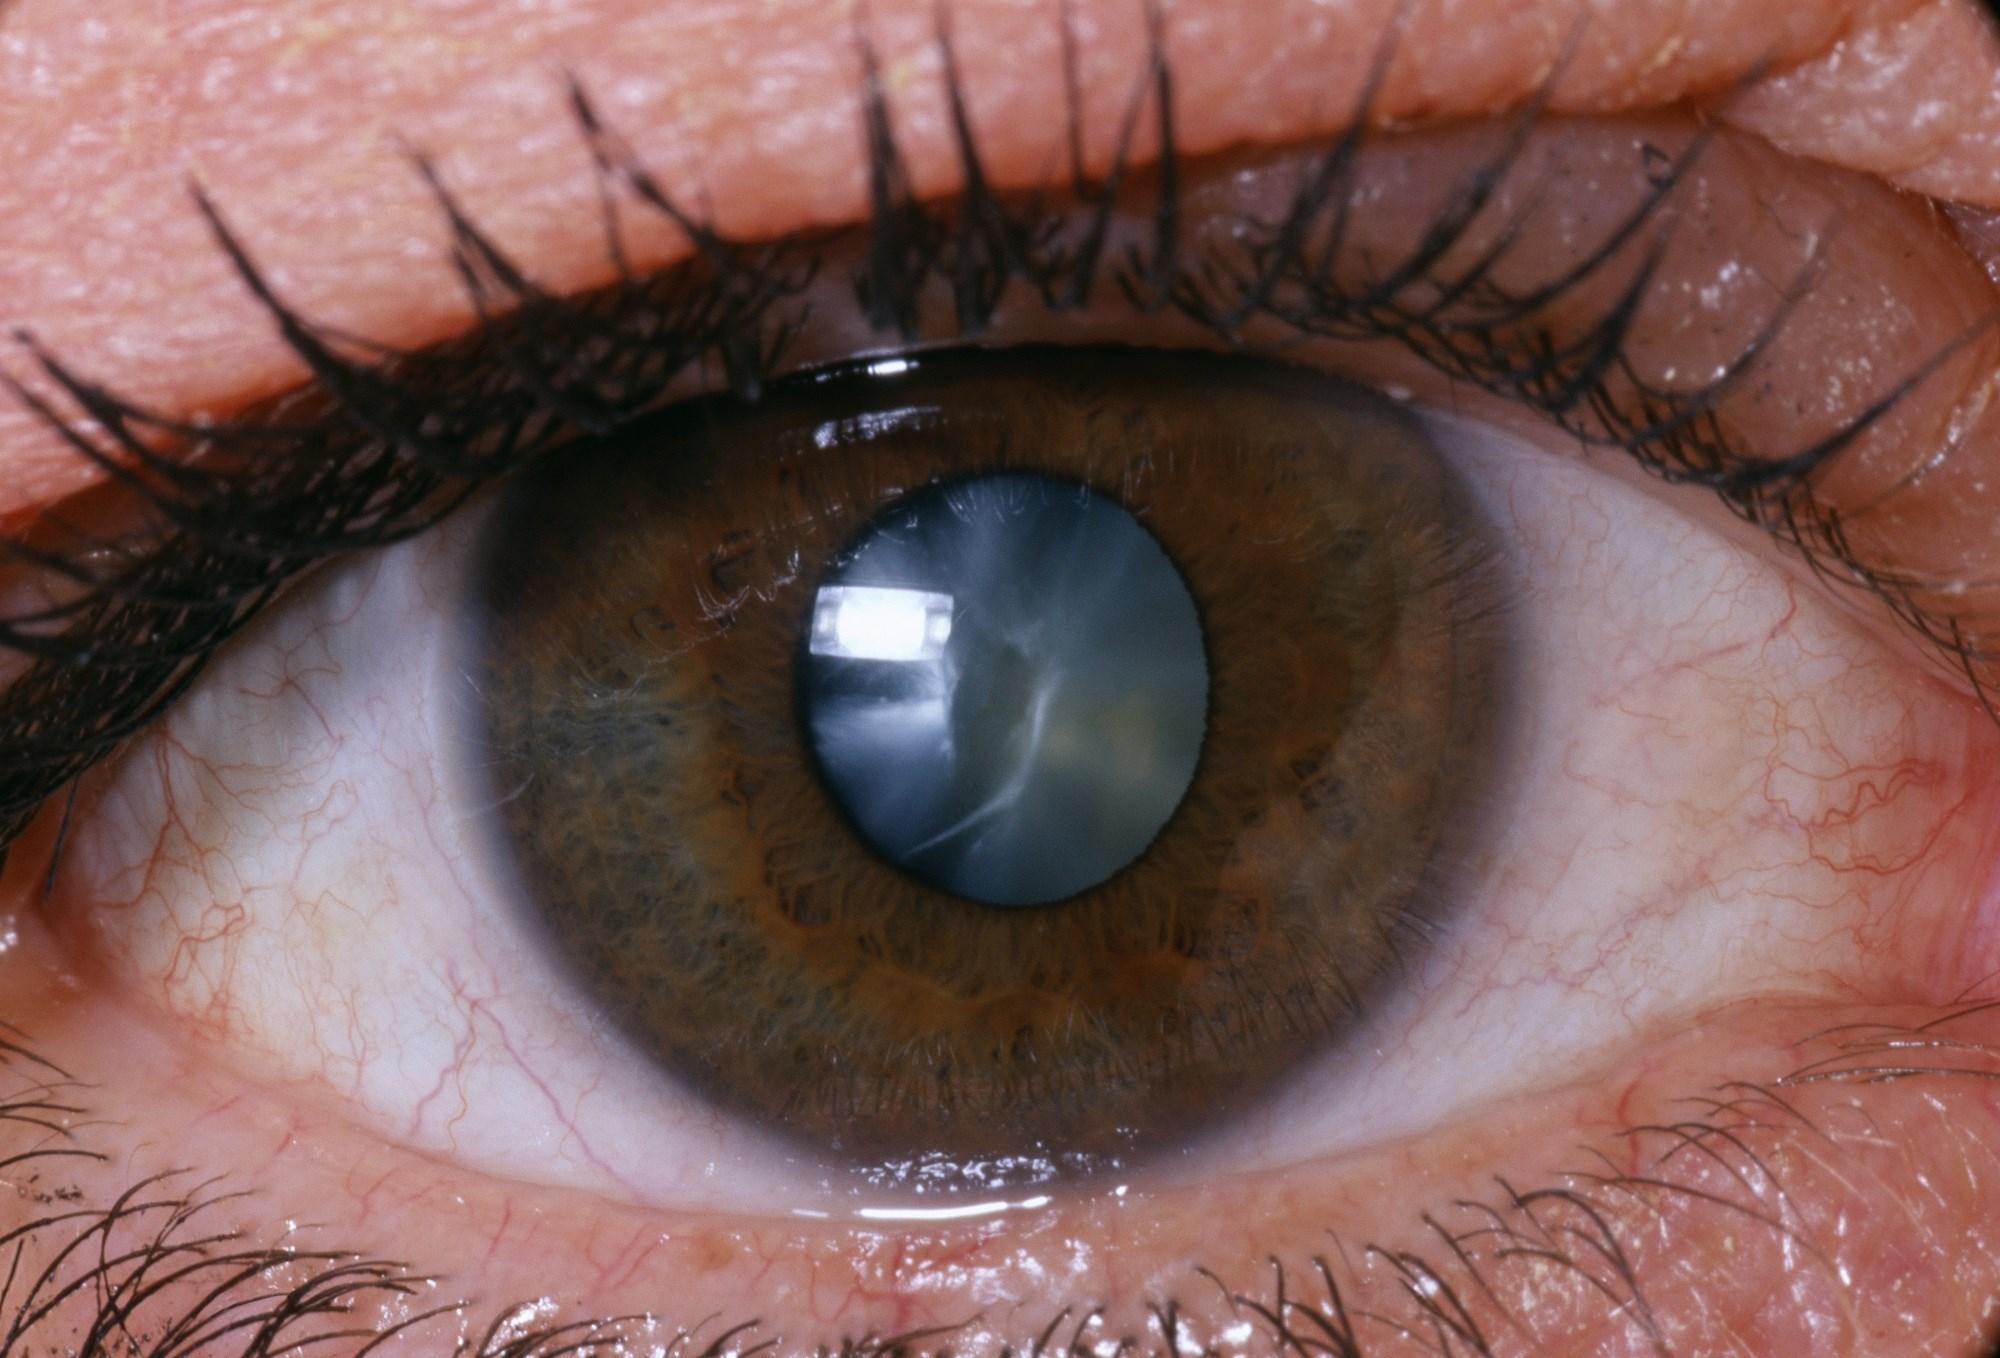 Pediatric Atopic Dermatitis Associated With Cataract Development